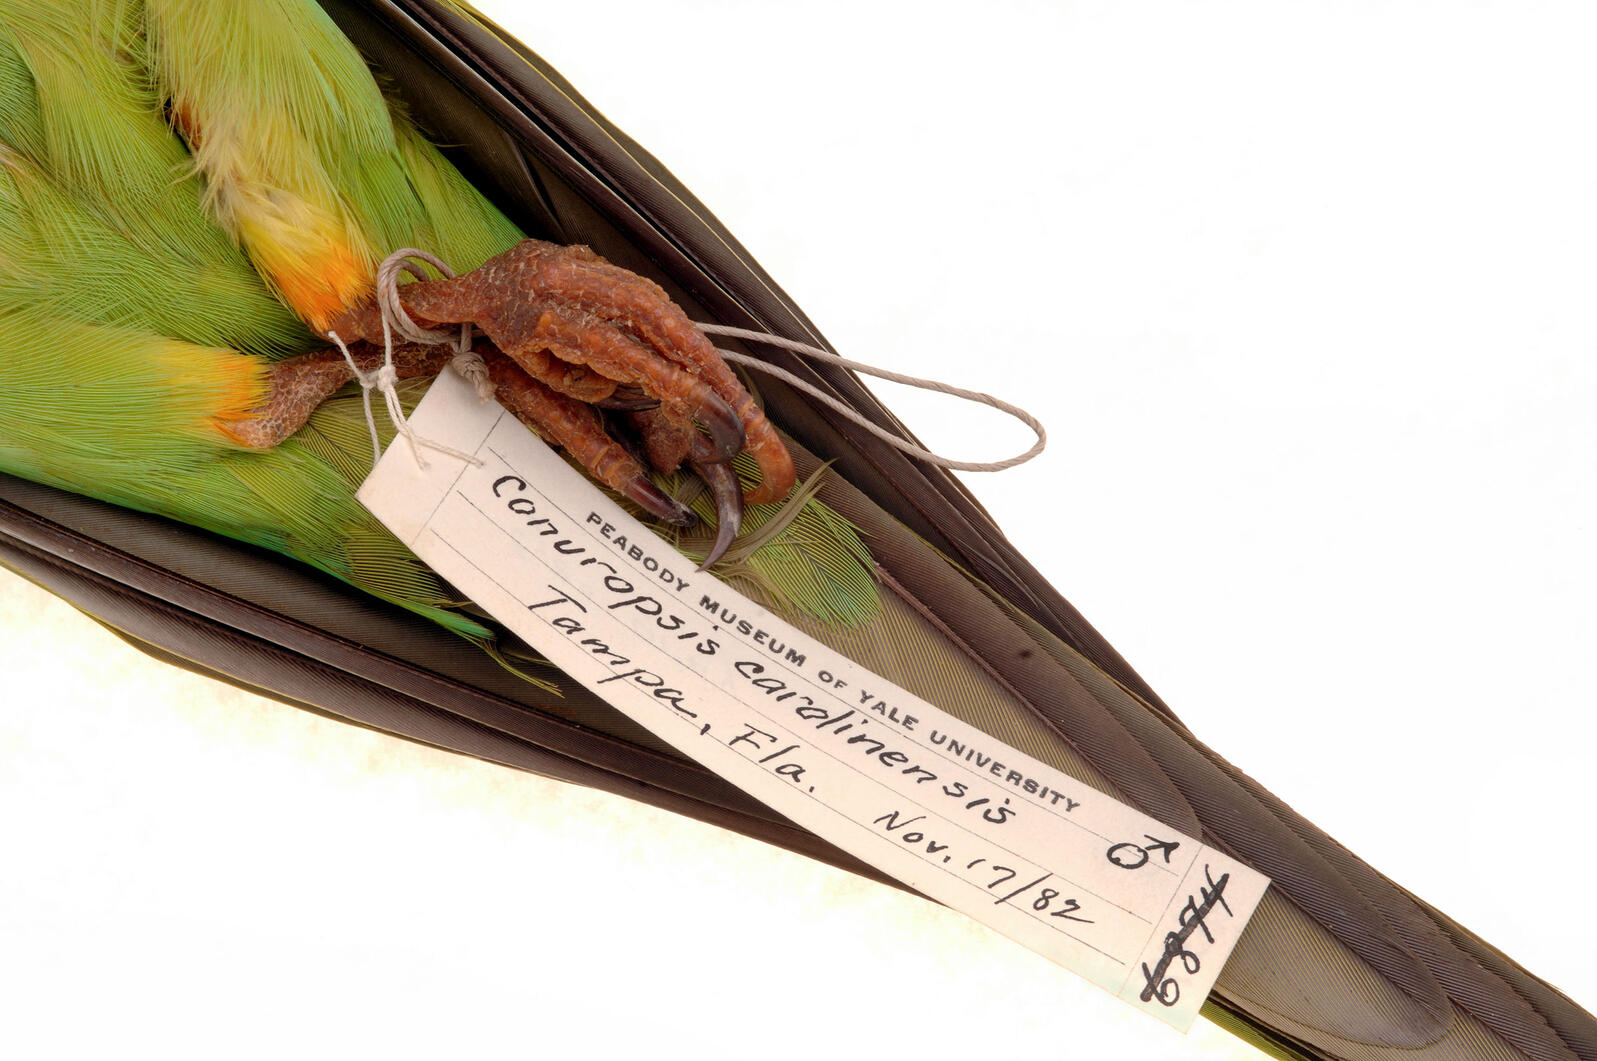 Carolina Parakeet specimen in the Yale University Peabody Museum. Michael Doolittle/Alamy